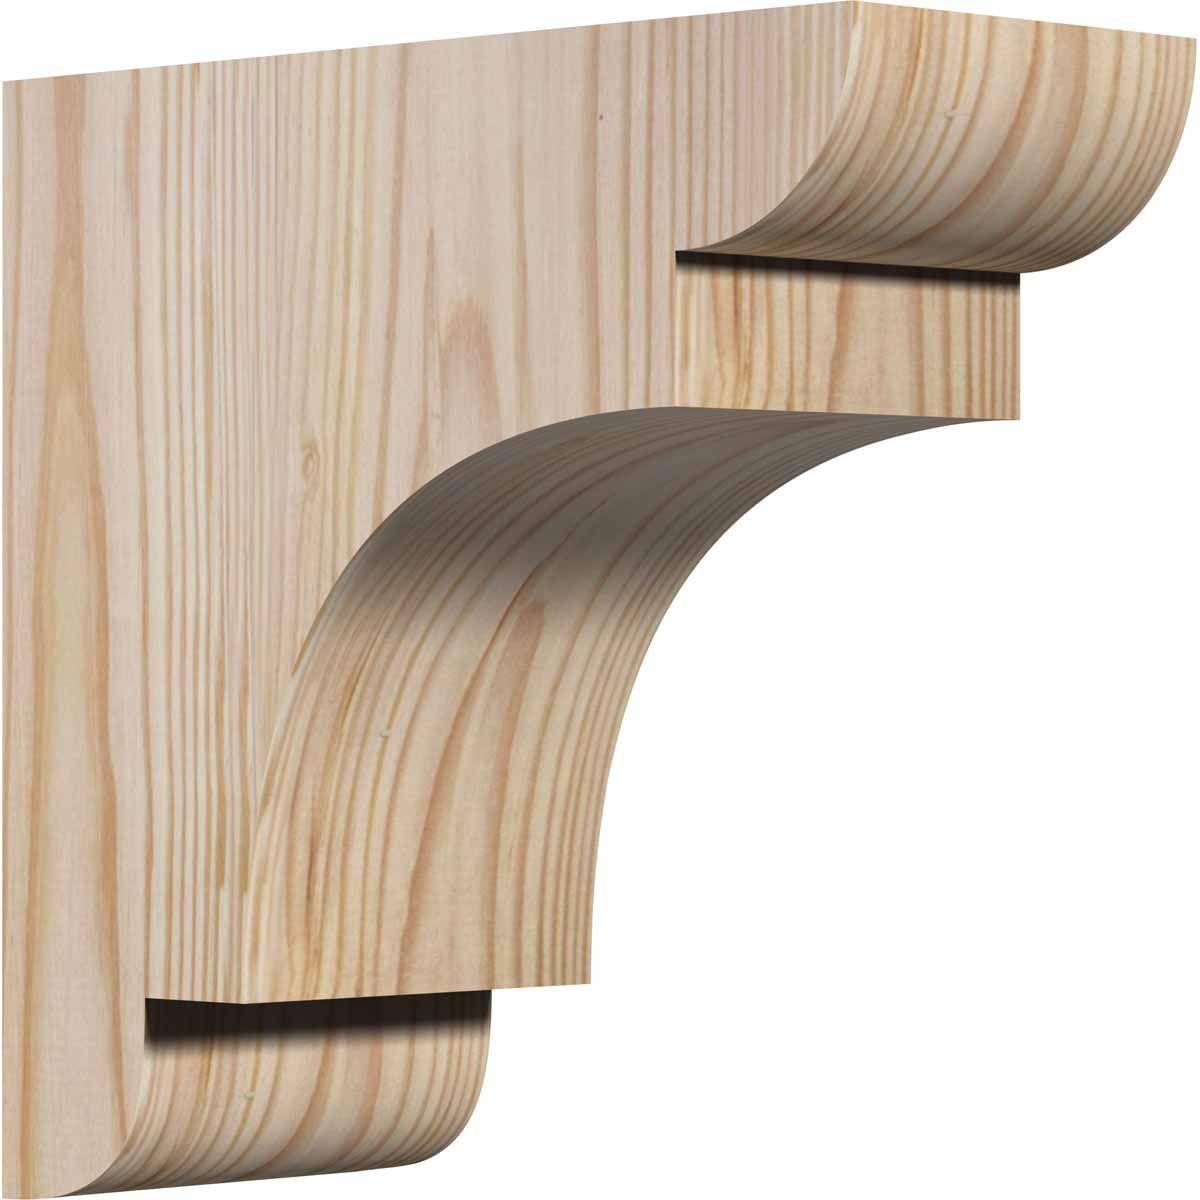 Ekena Millwork CORNEB00 New Brighton Rustic Timber Wood Corbel CORRCORNEB00 - ArchitecturalDepot.com